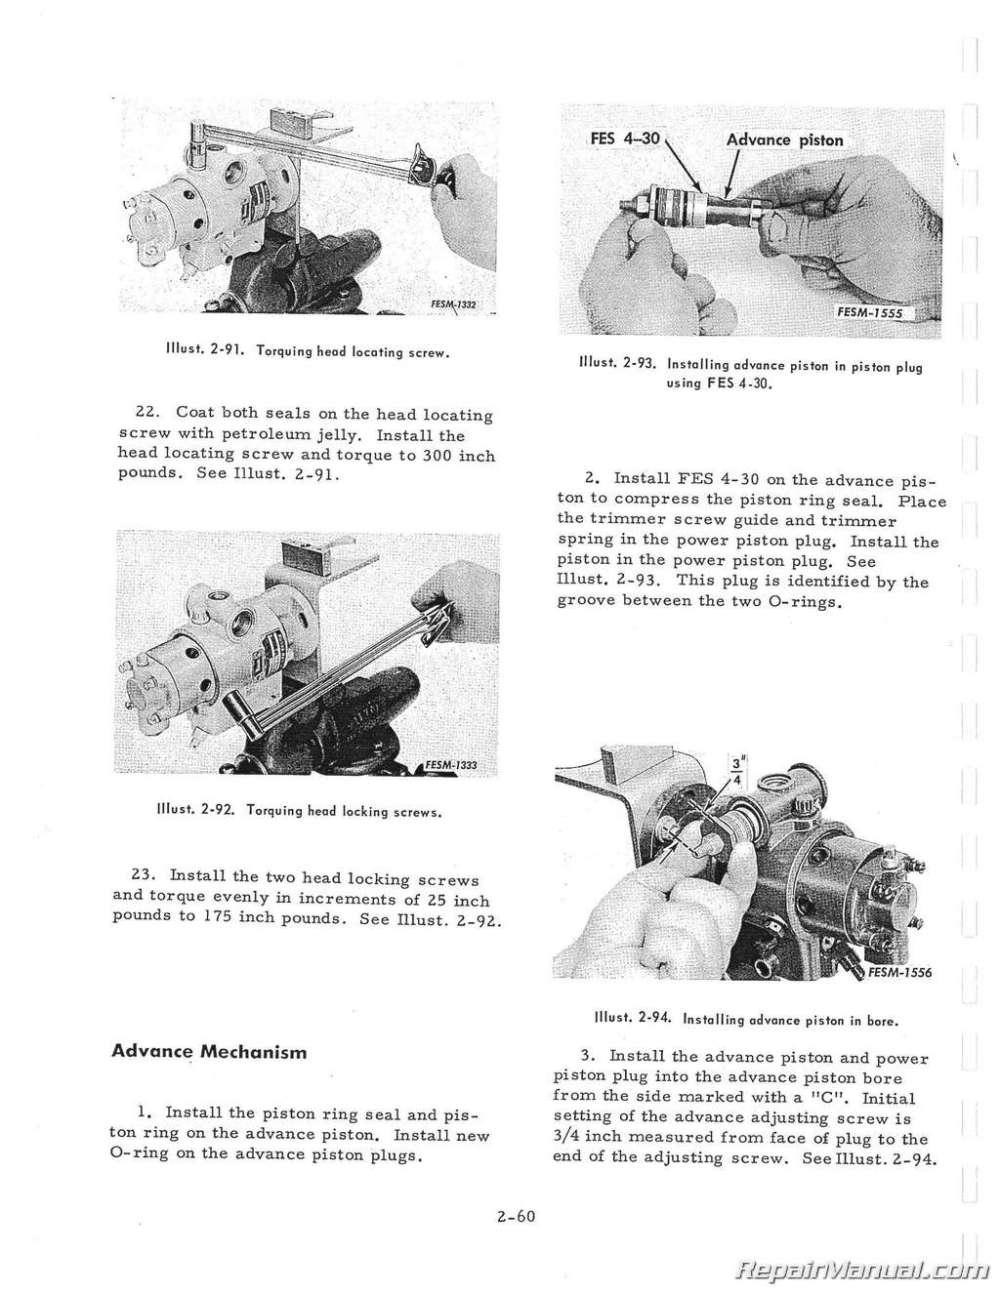 medium resolution of farmall 12 volt wiring diagram farmall diagrams farmall 140 farmall 806 transmission parts diagram further farmall